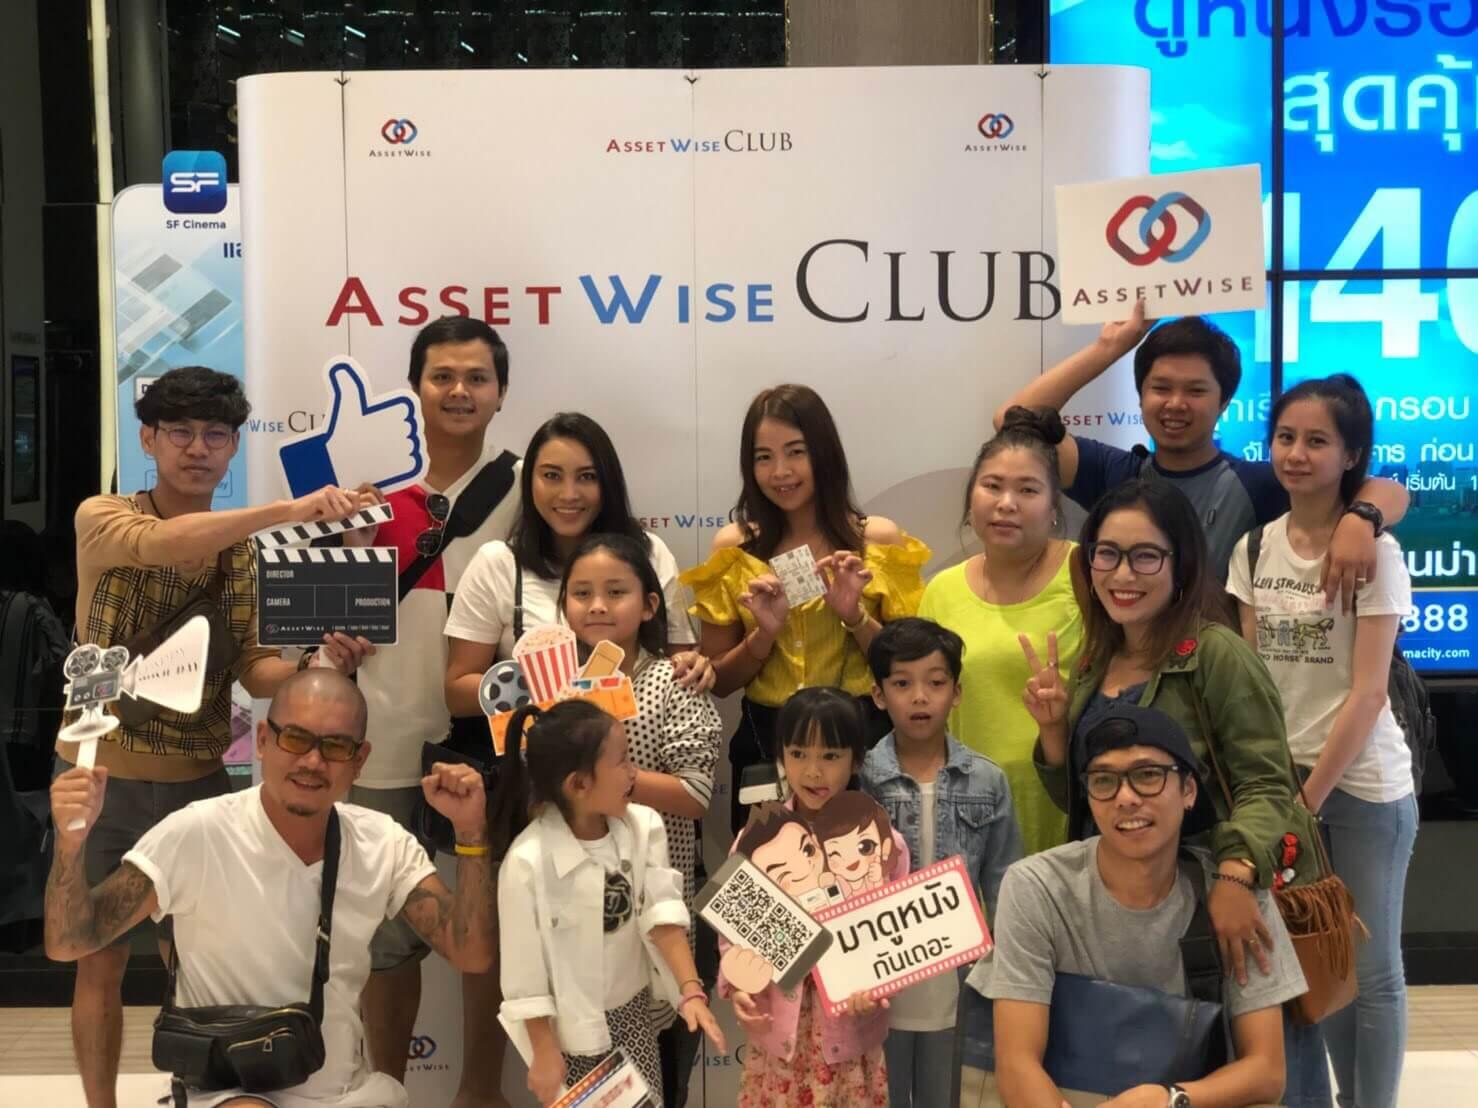 AssetWise ชวนดู 2,215 เชื่อ บ้า กล้า ก้าว